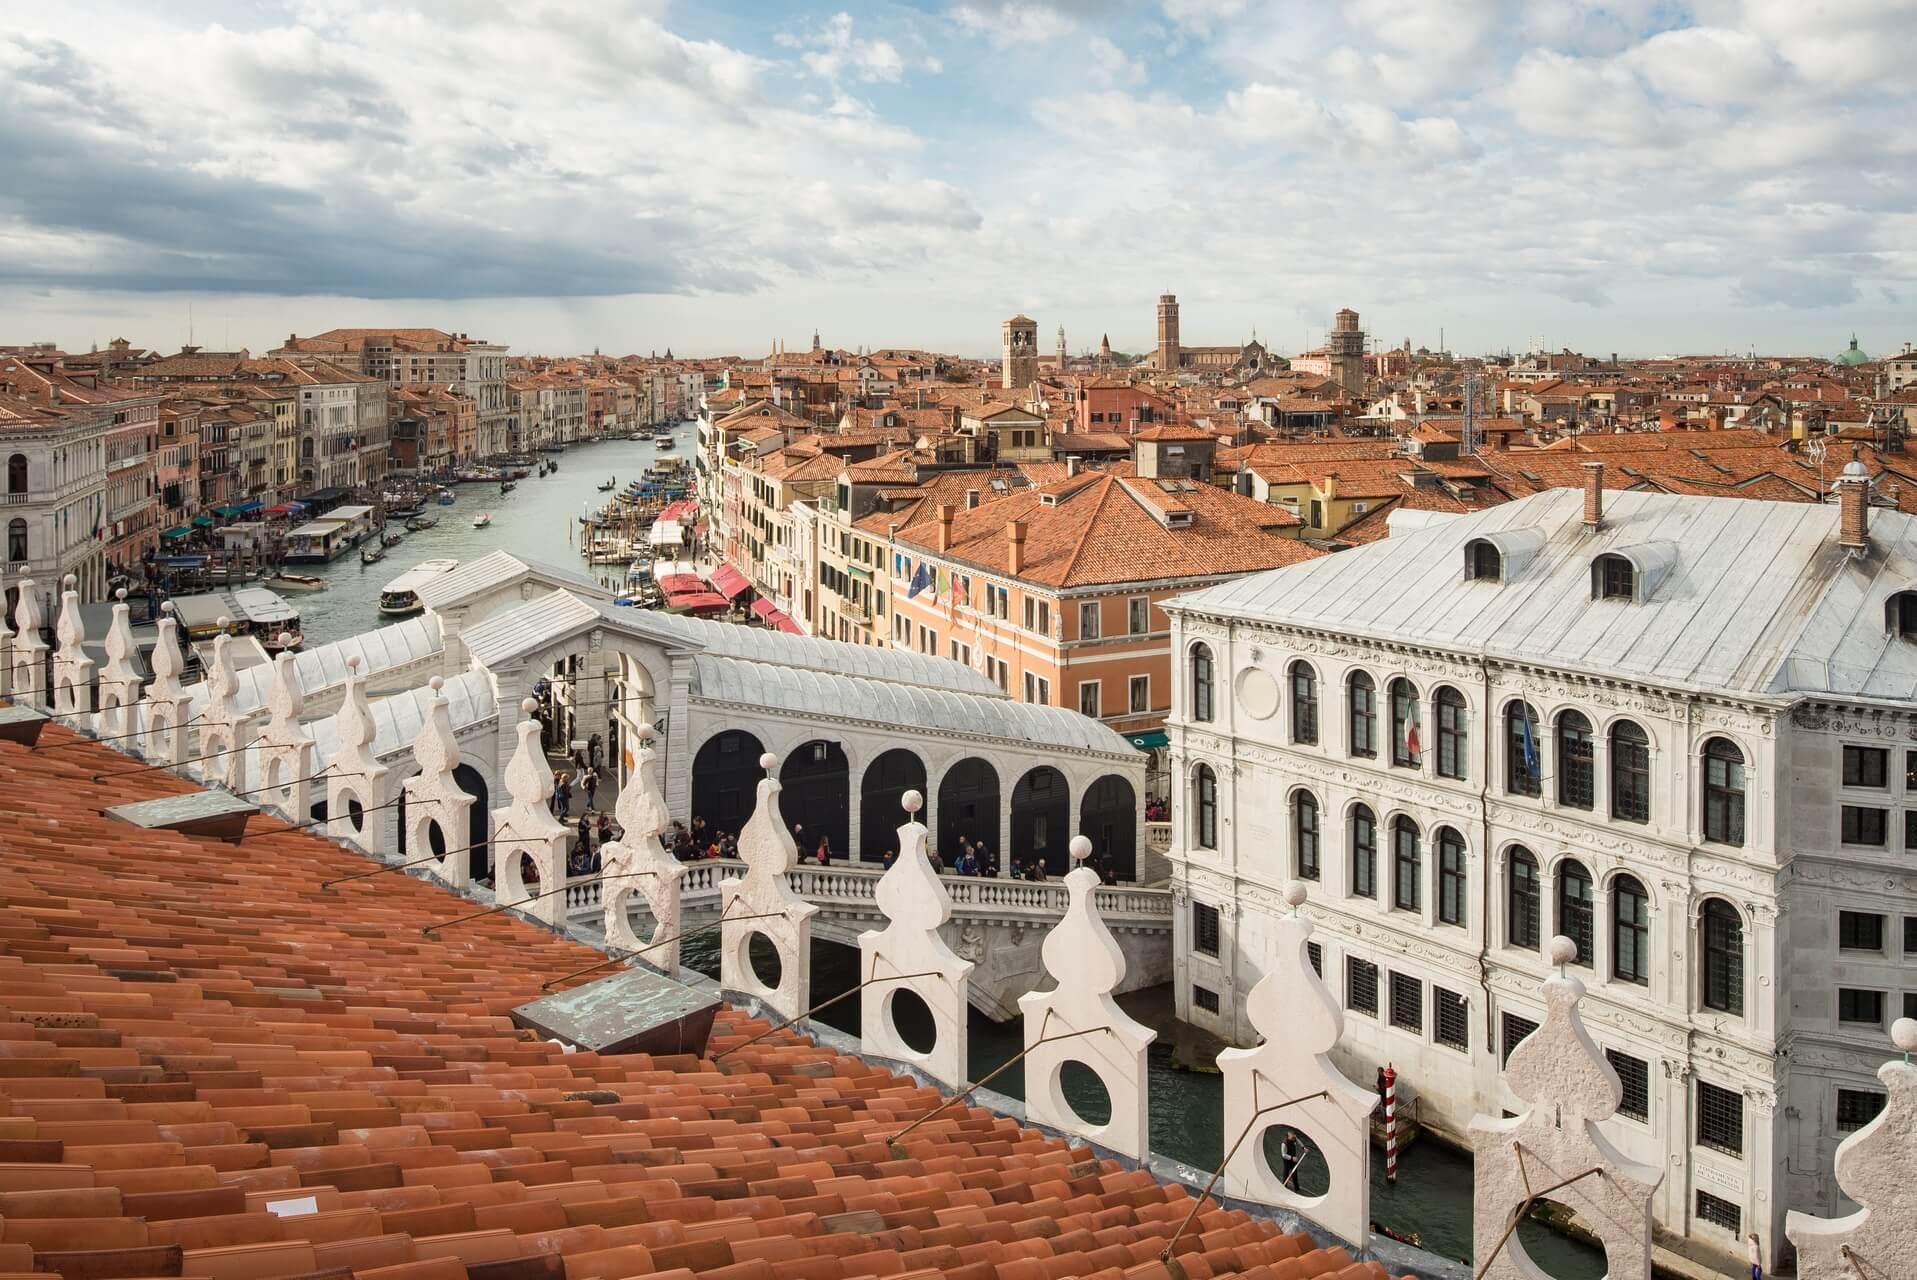 Italien: Venedig Italiy: Venice roof top view to Rialto Bridge, Fotograf: Steffen Lohse